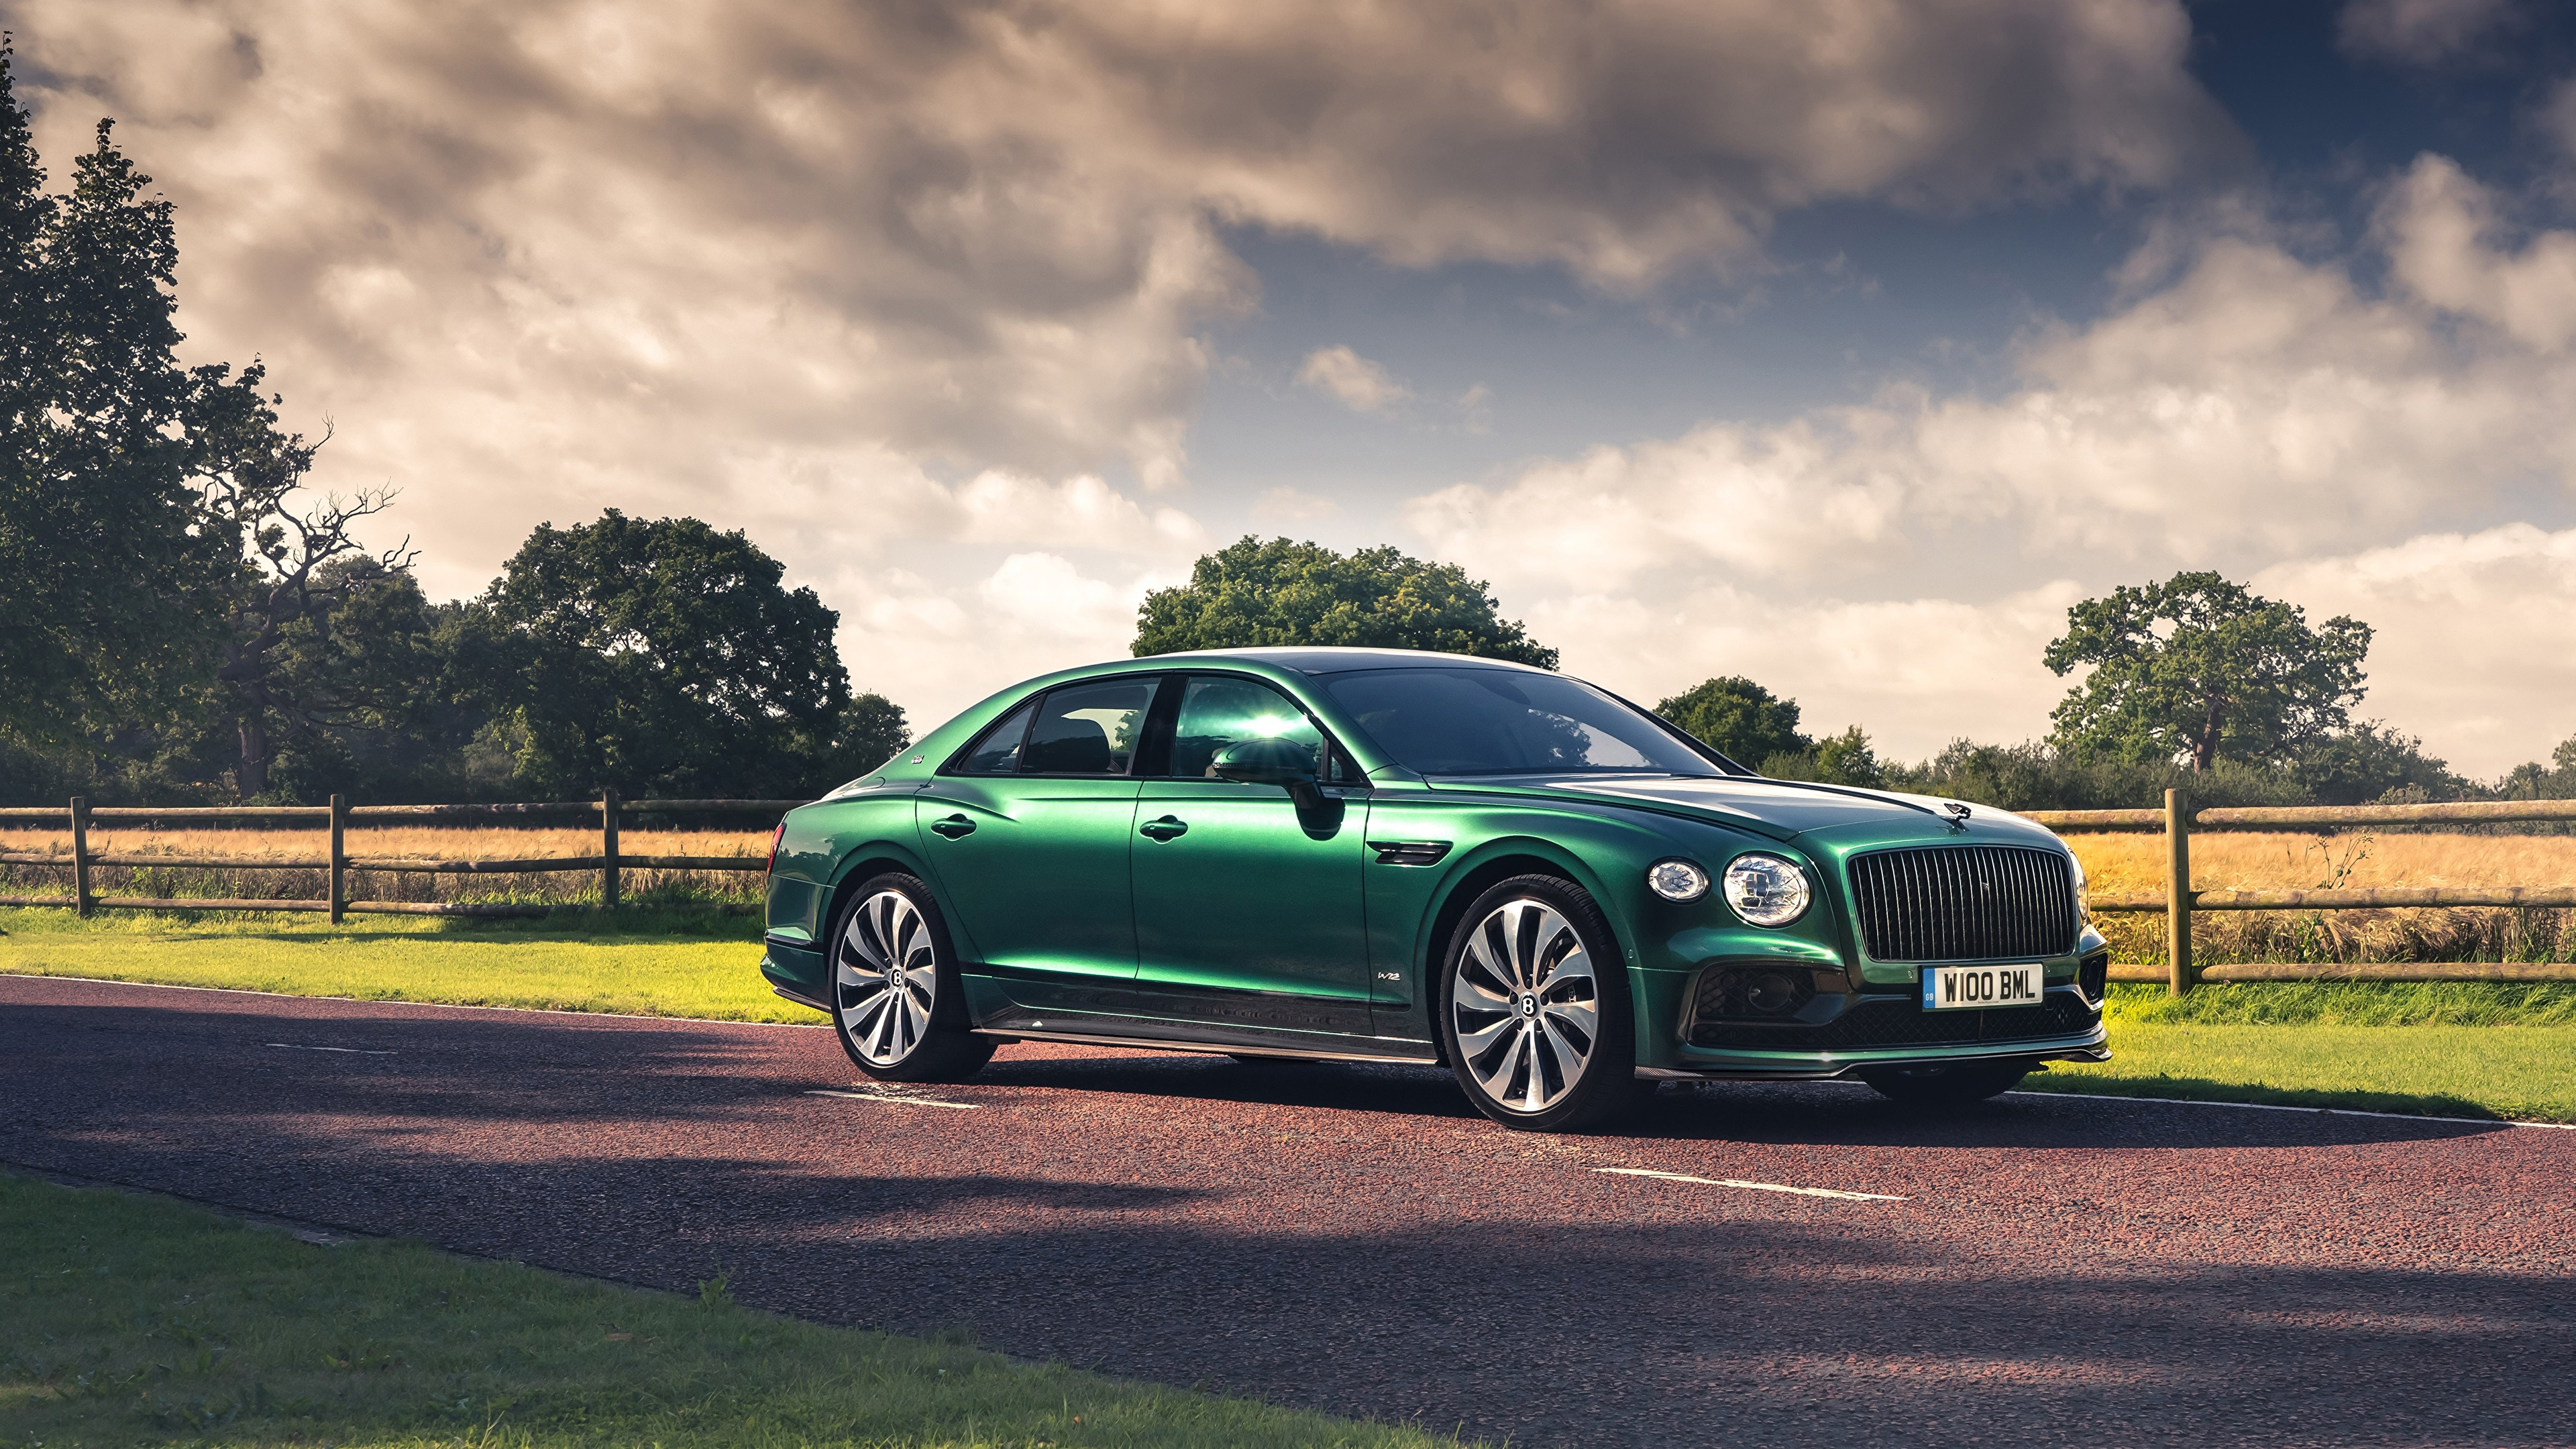 Fotos Bentley Flying Spur, Styling Specification, UK-spec, 2020 Limousine Grün Autos Seitlich 3840x2160 auto automobil